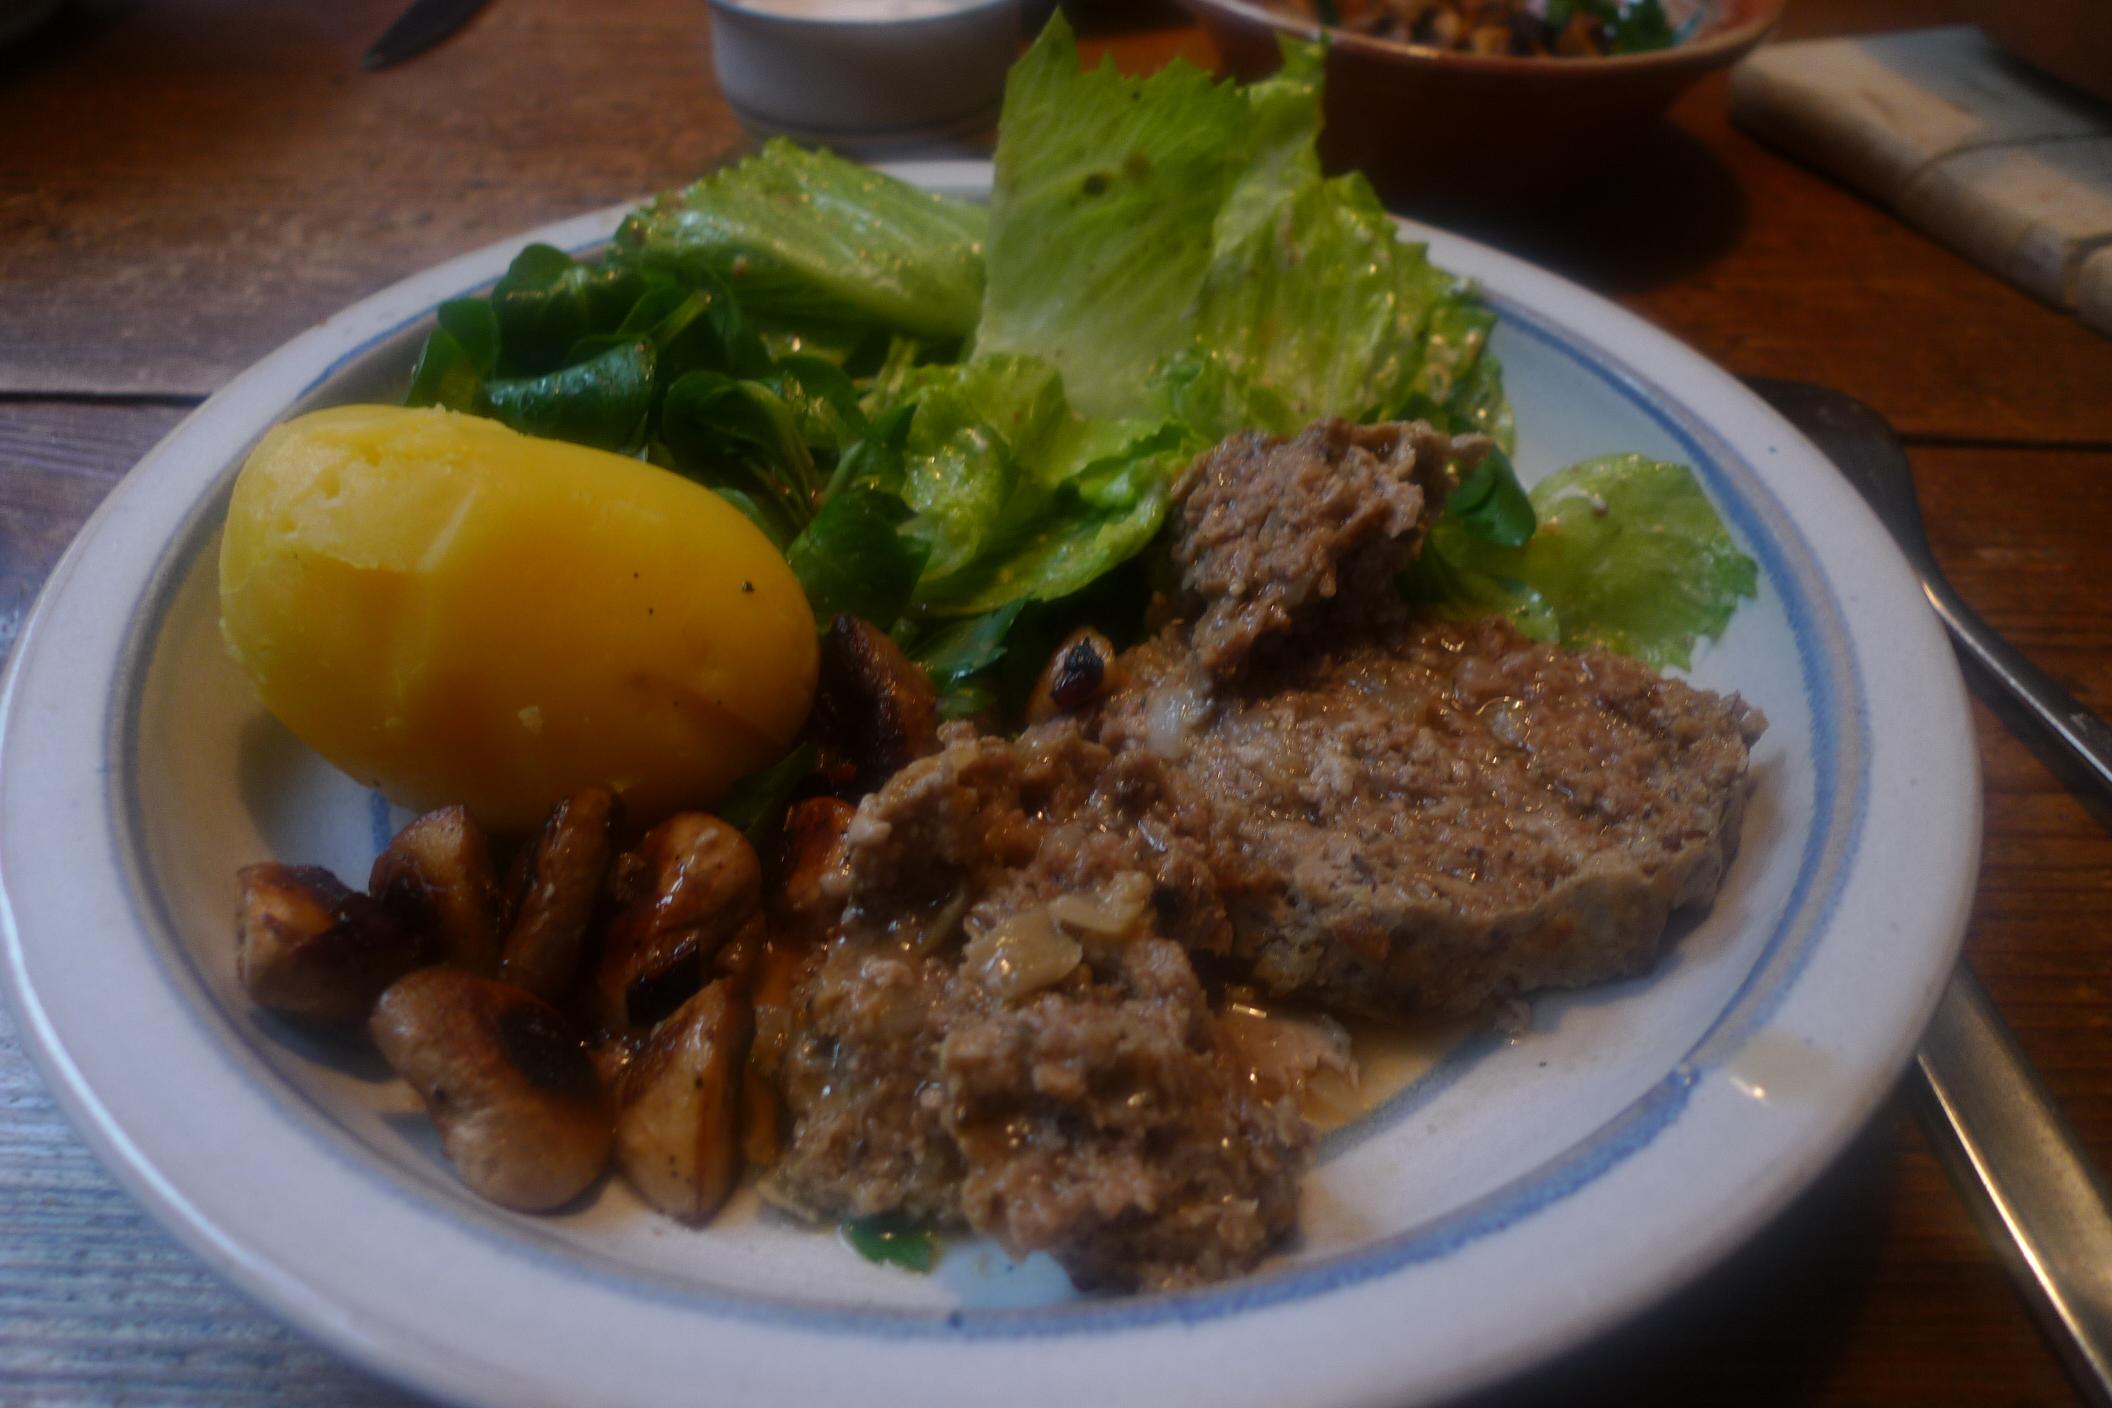 8.2.13-Hackbraten-Salate-Kartoffel-Pilze